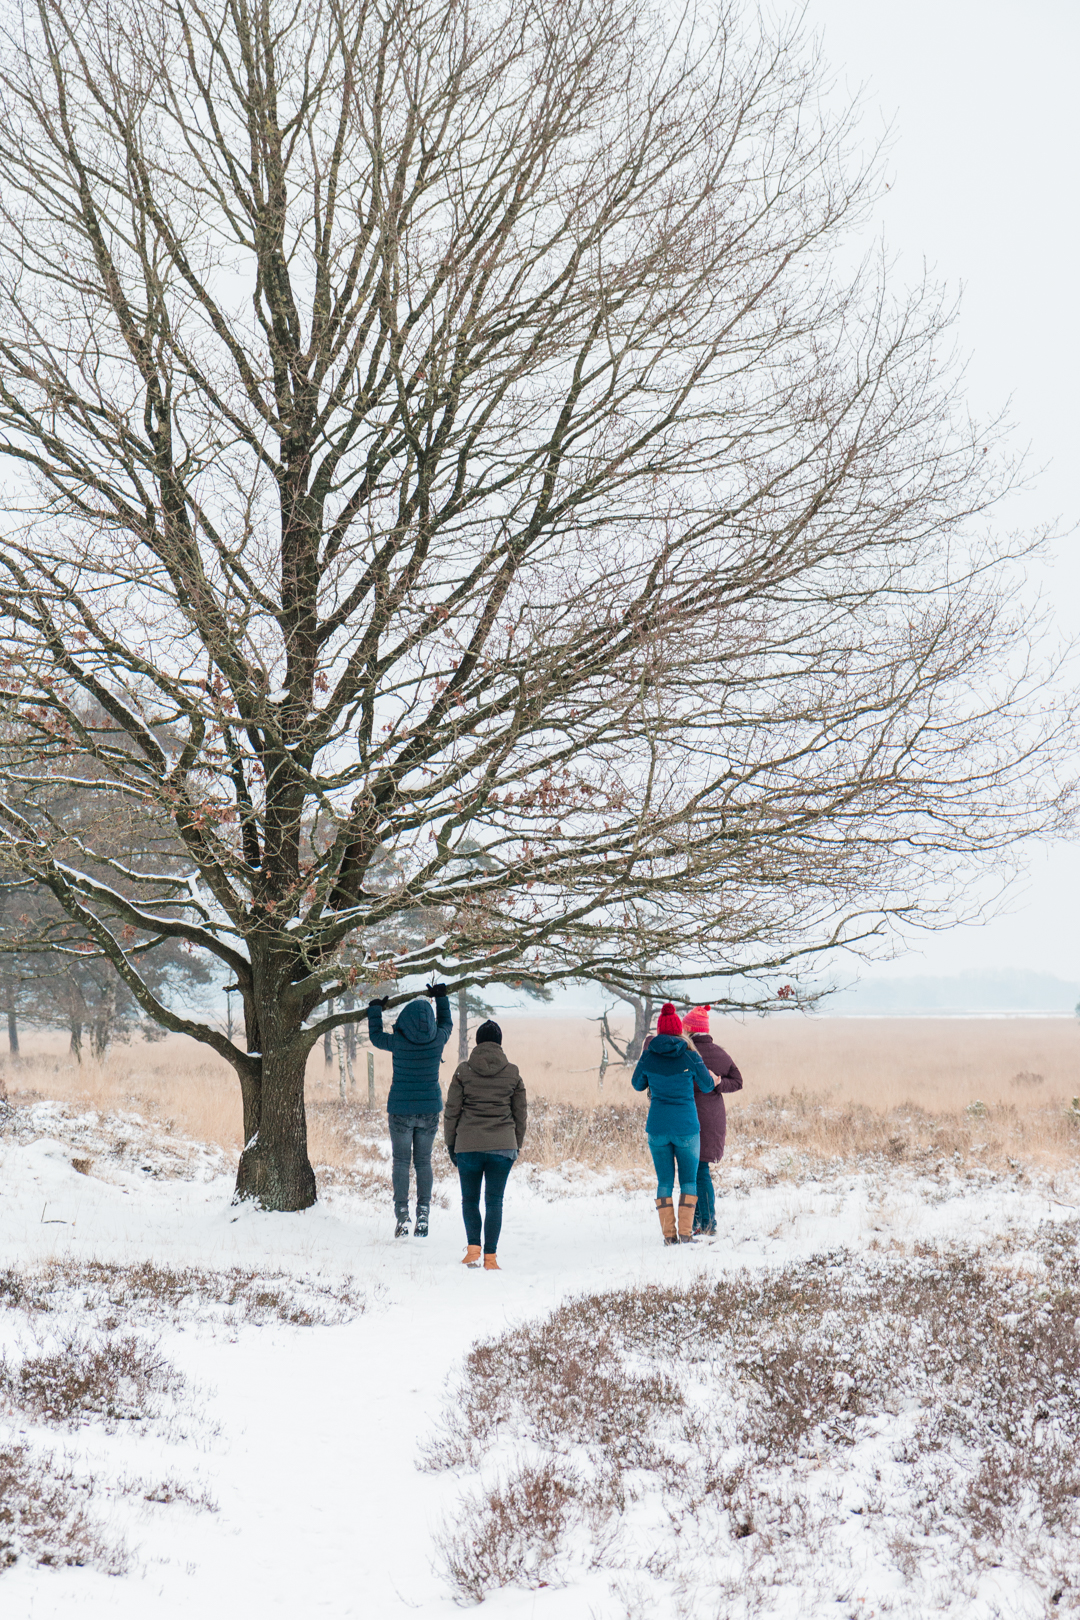 Onderneemsters in de sneeuw